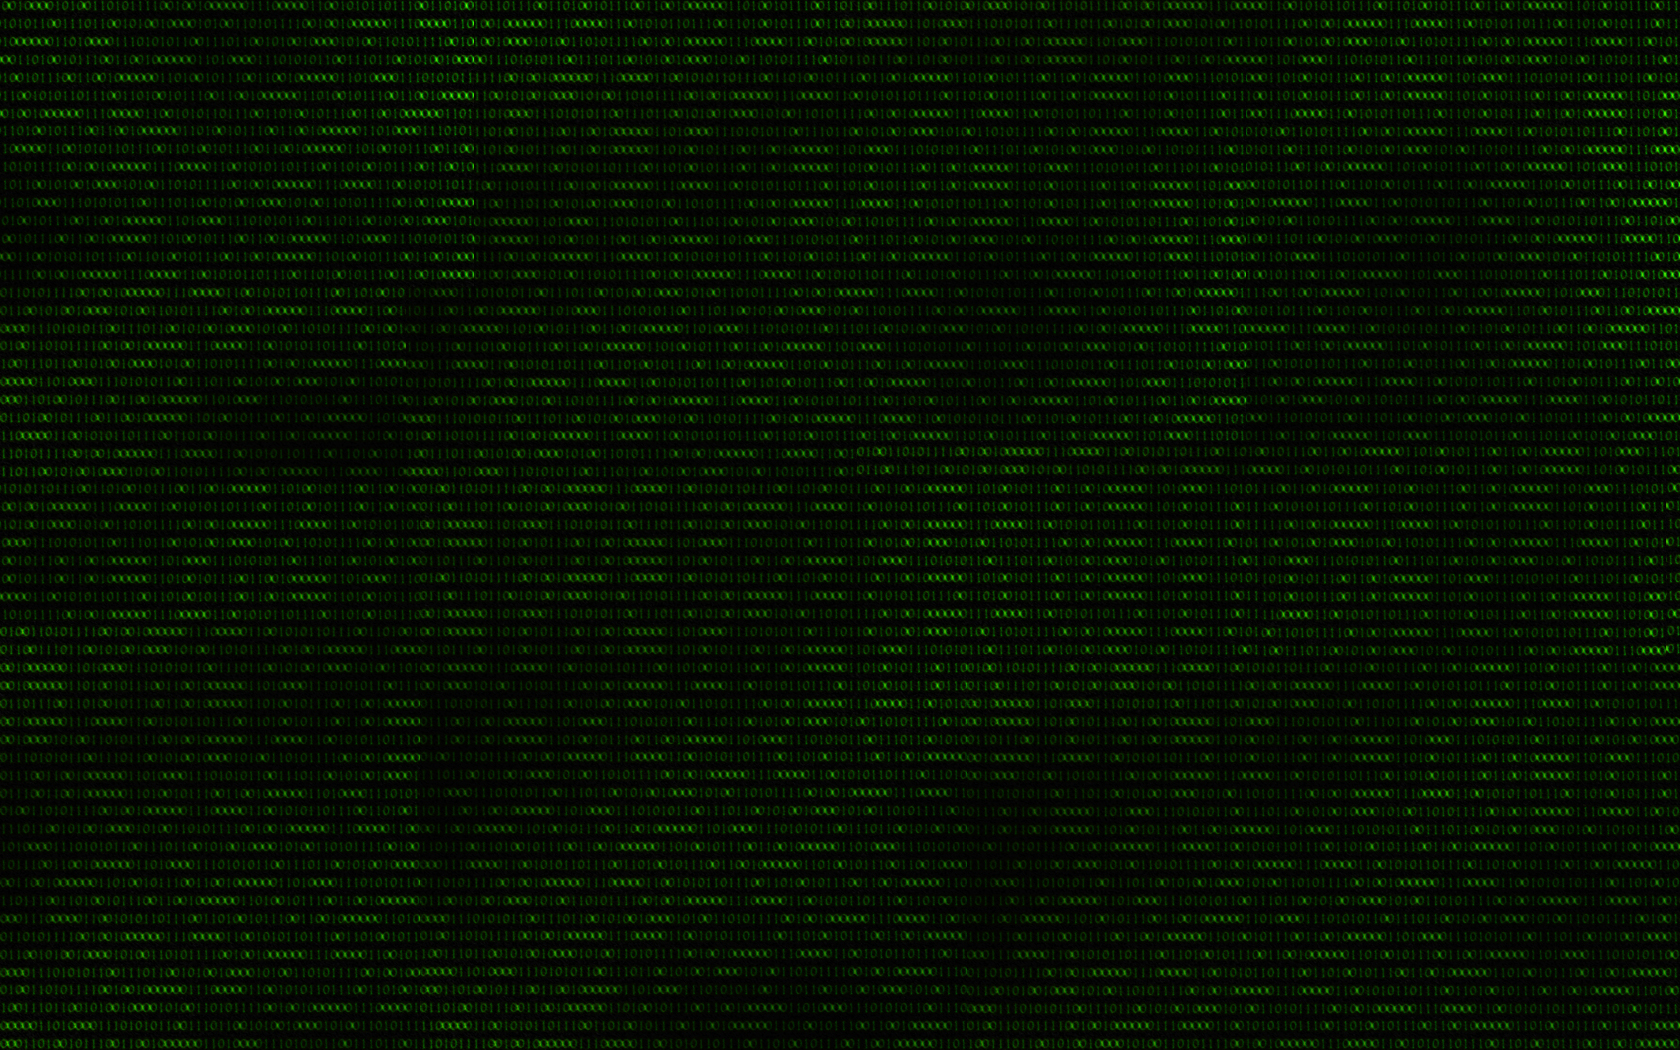 Binary wallpaper 2 by Reapsert